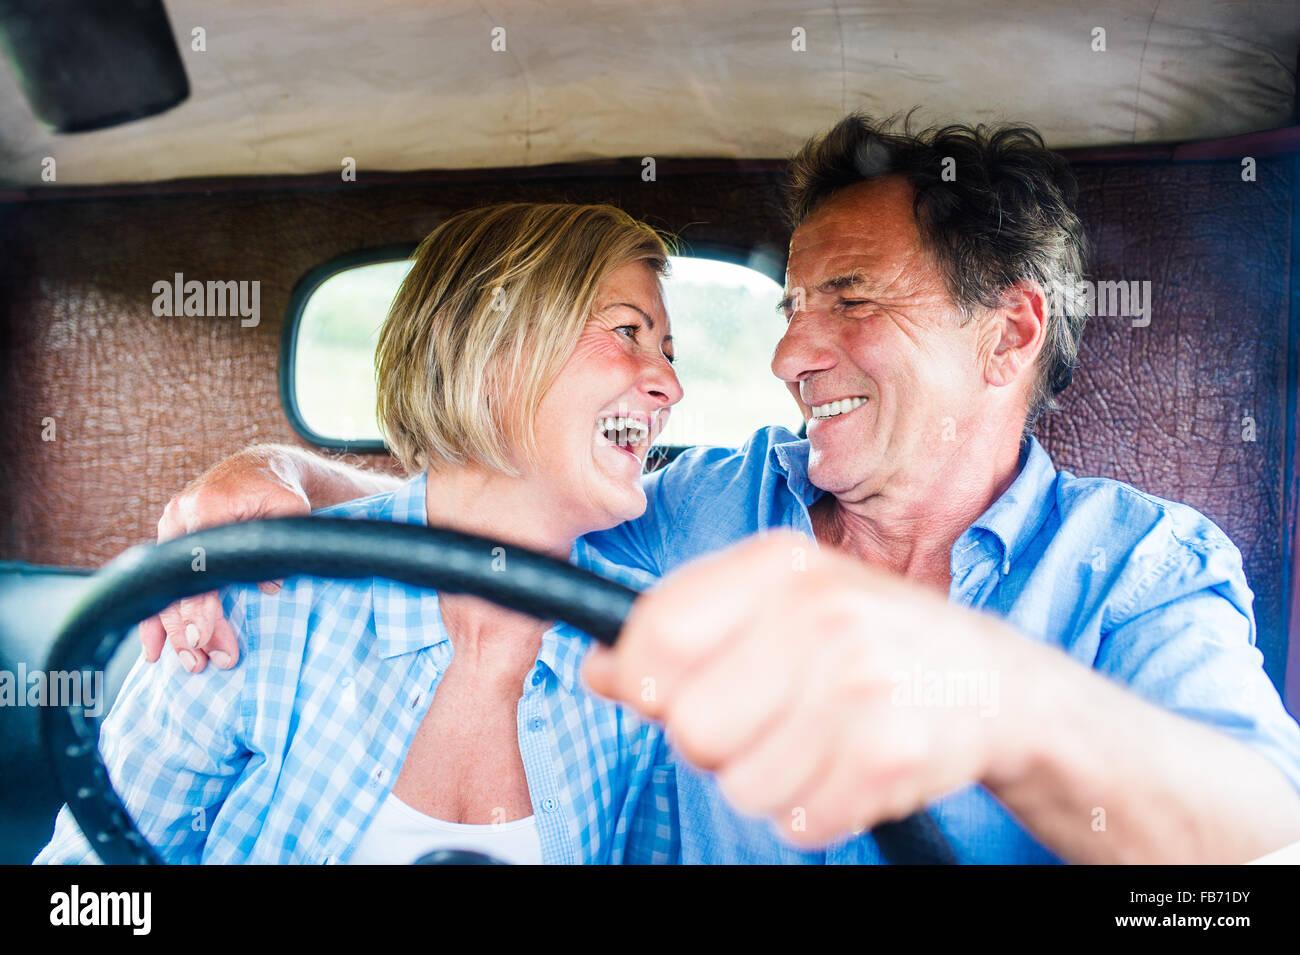 Senior couple in a car - Stock Image